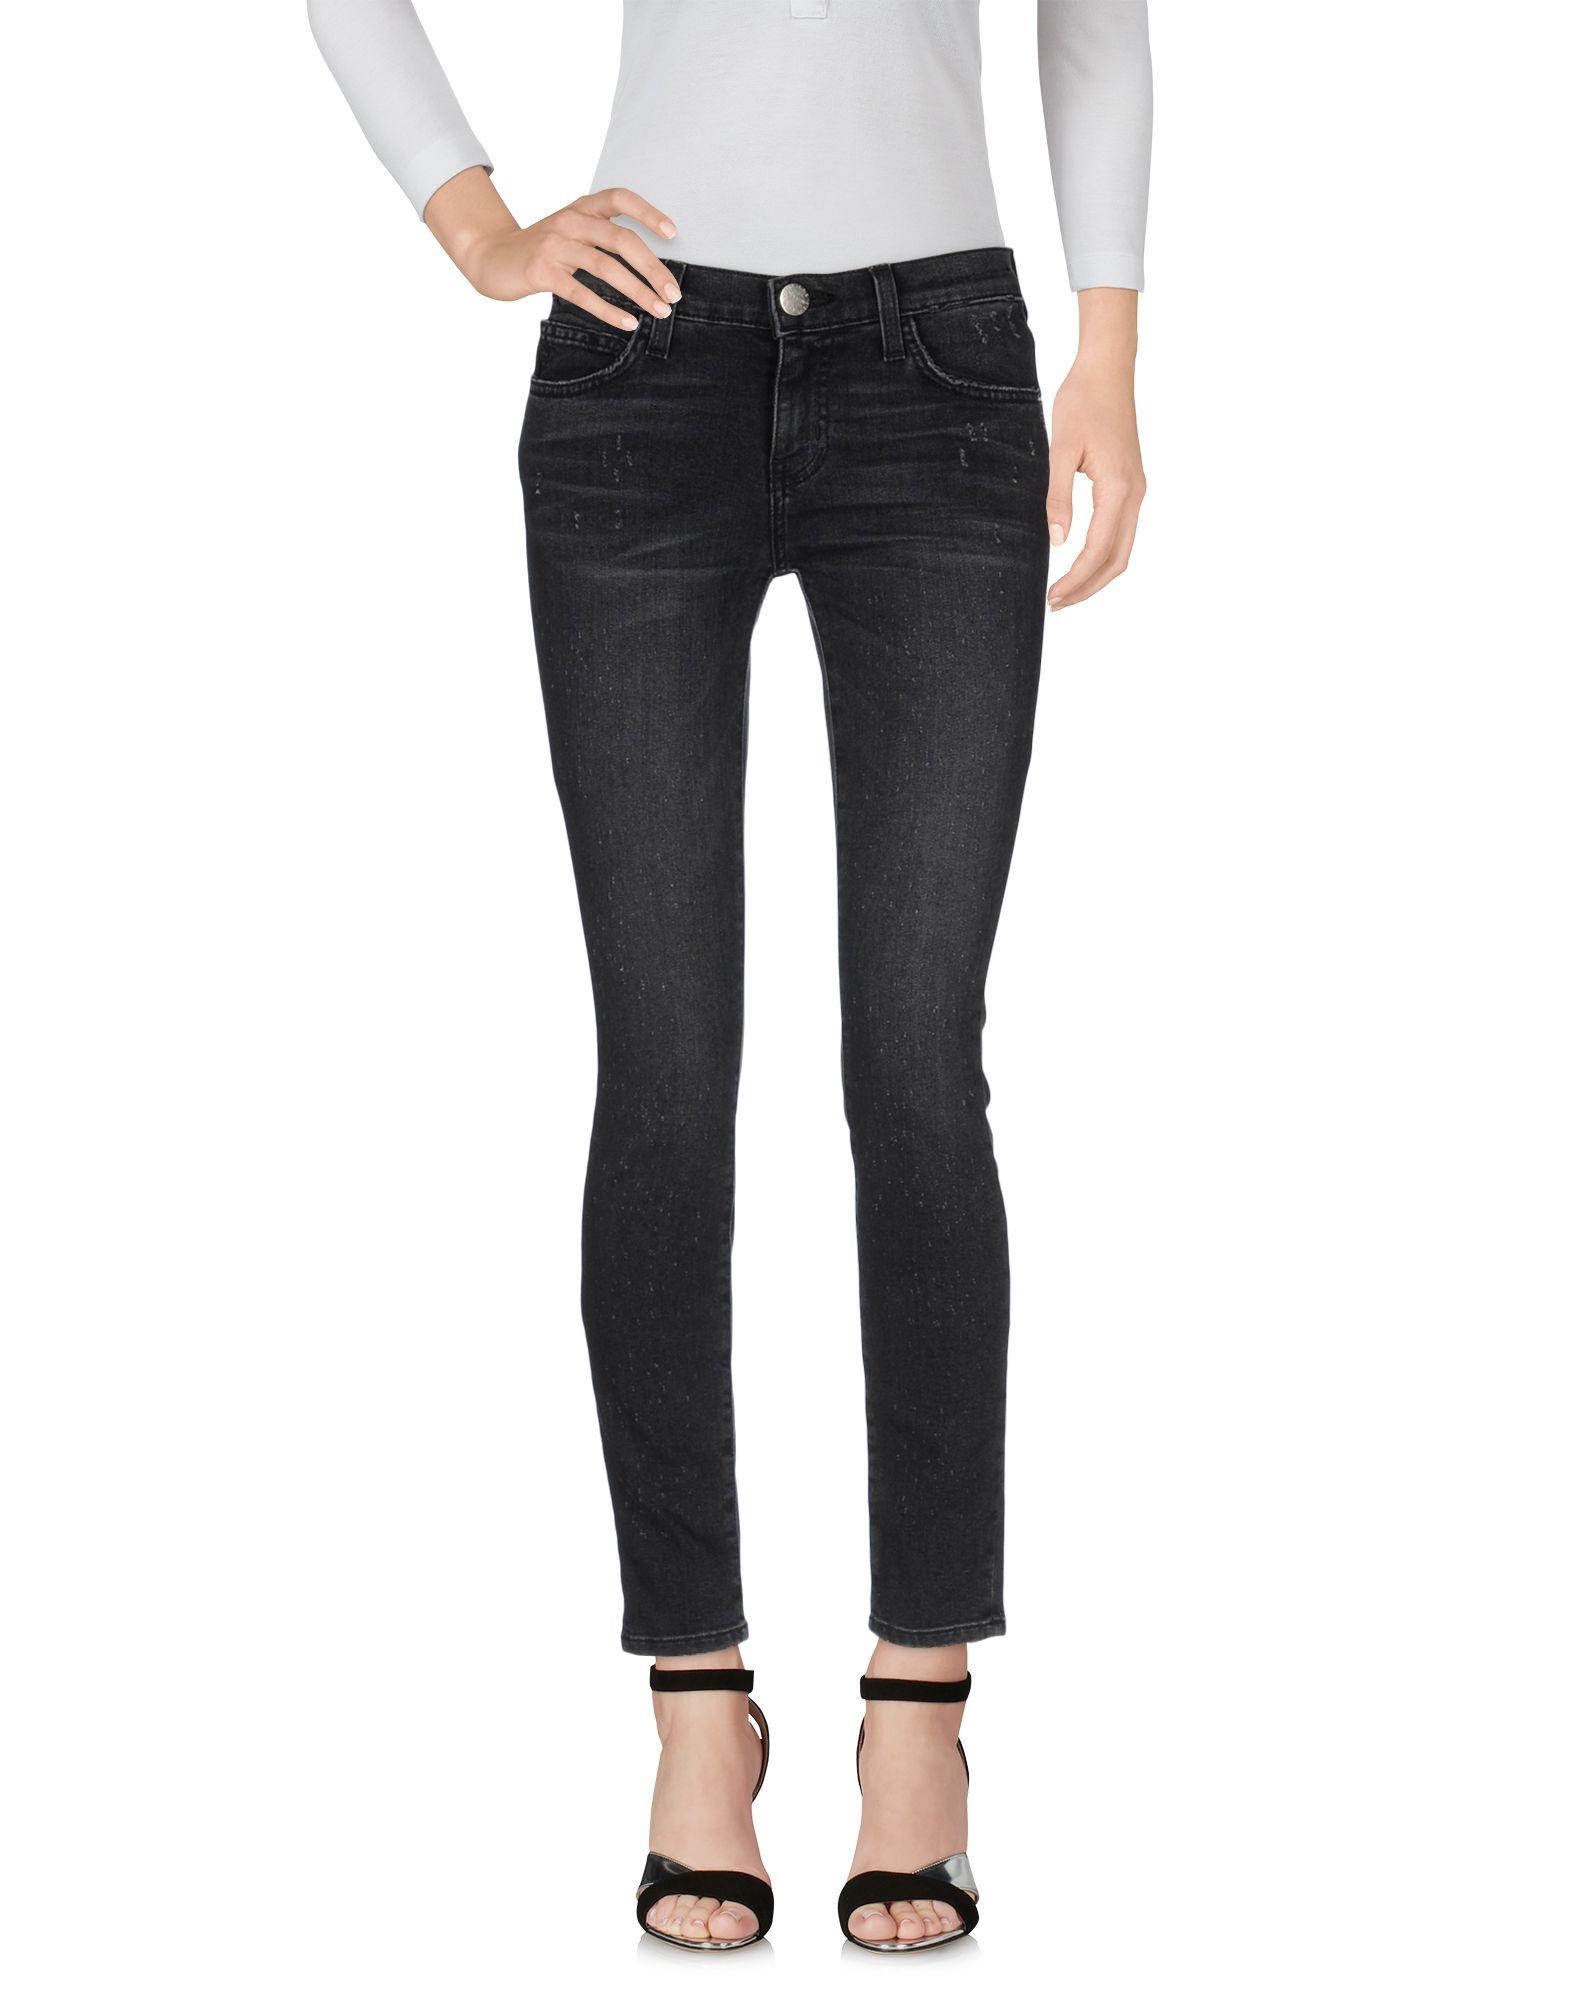 Pantaloni Jeans Current/Elliott Donna - Acquista online su 1Ylnb